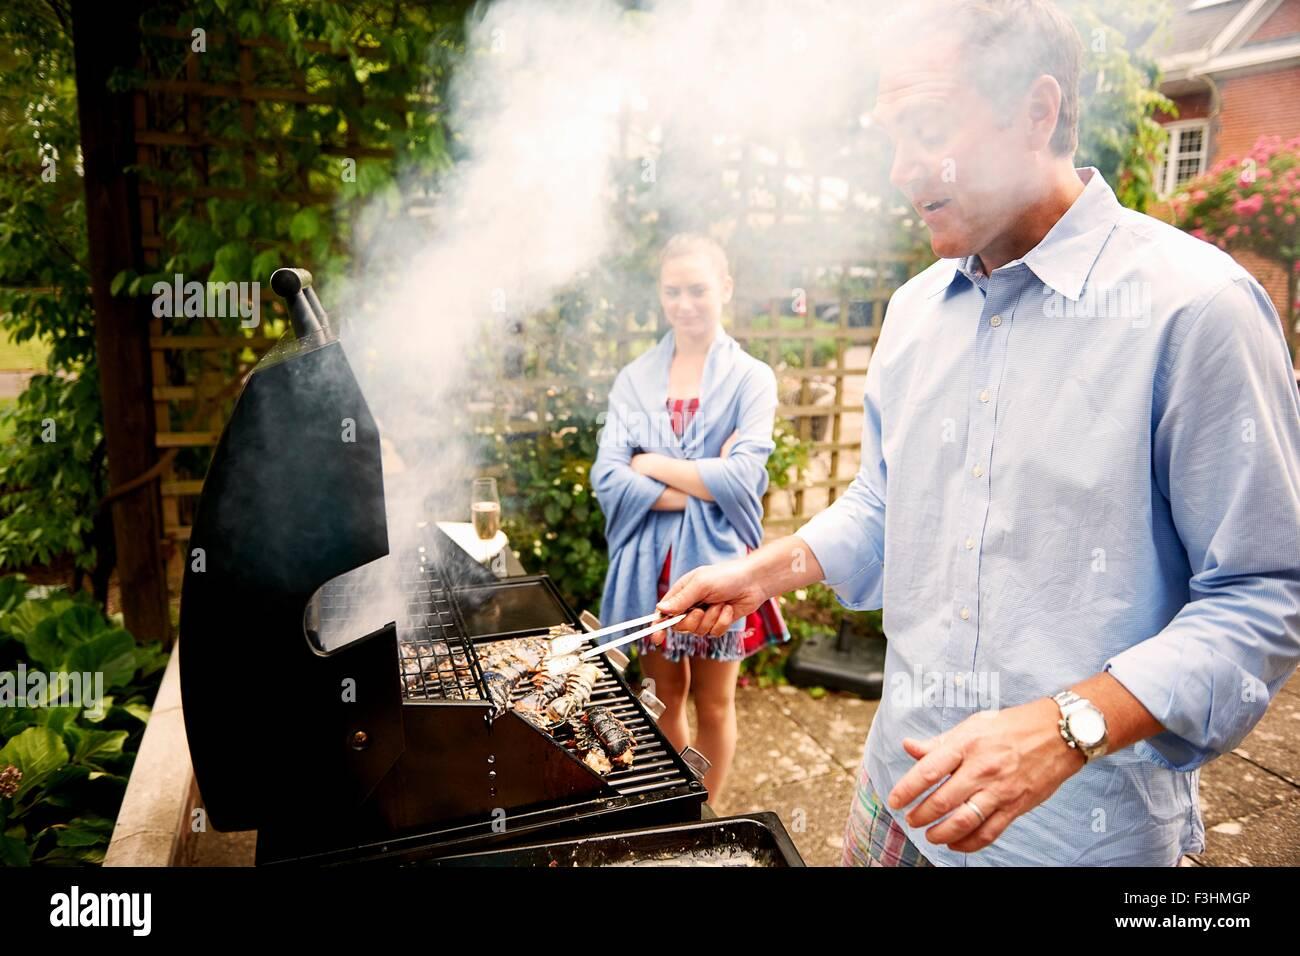 Fille regardant père cook sea food sur barbecue Photo Stock